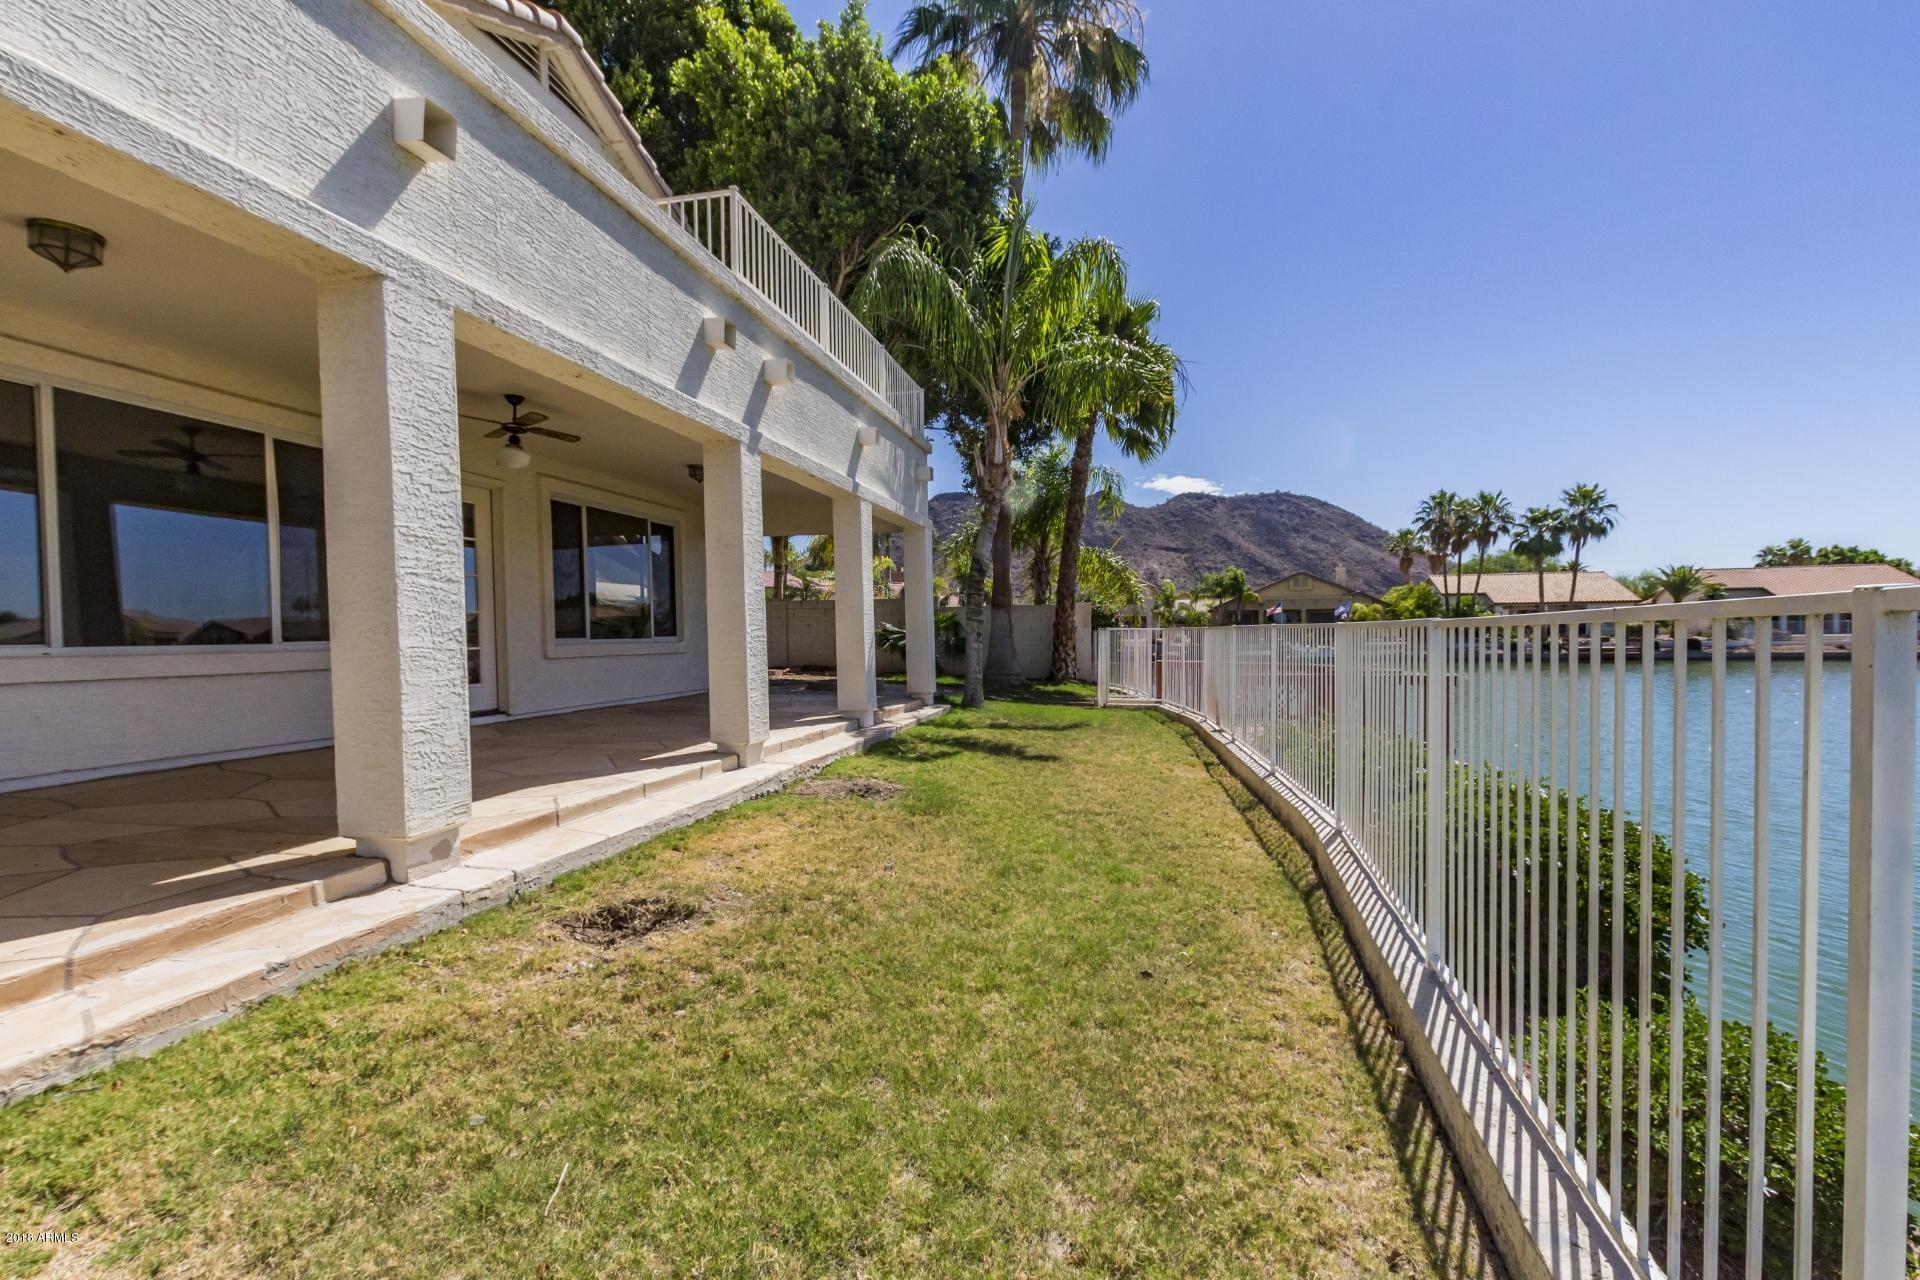 Glendale AZ 85308 Photo 9